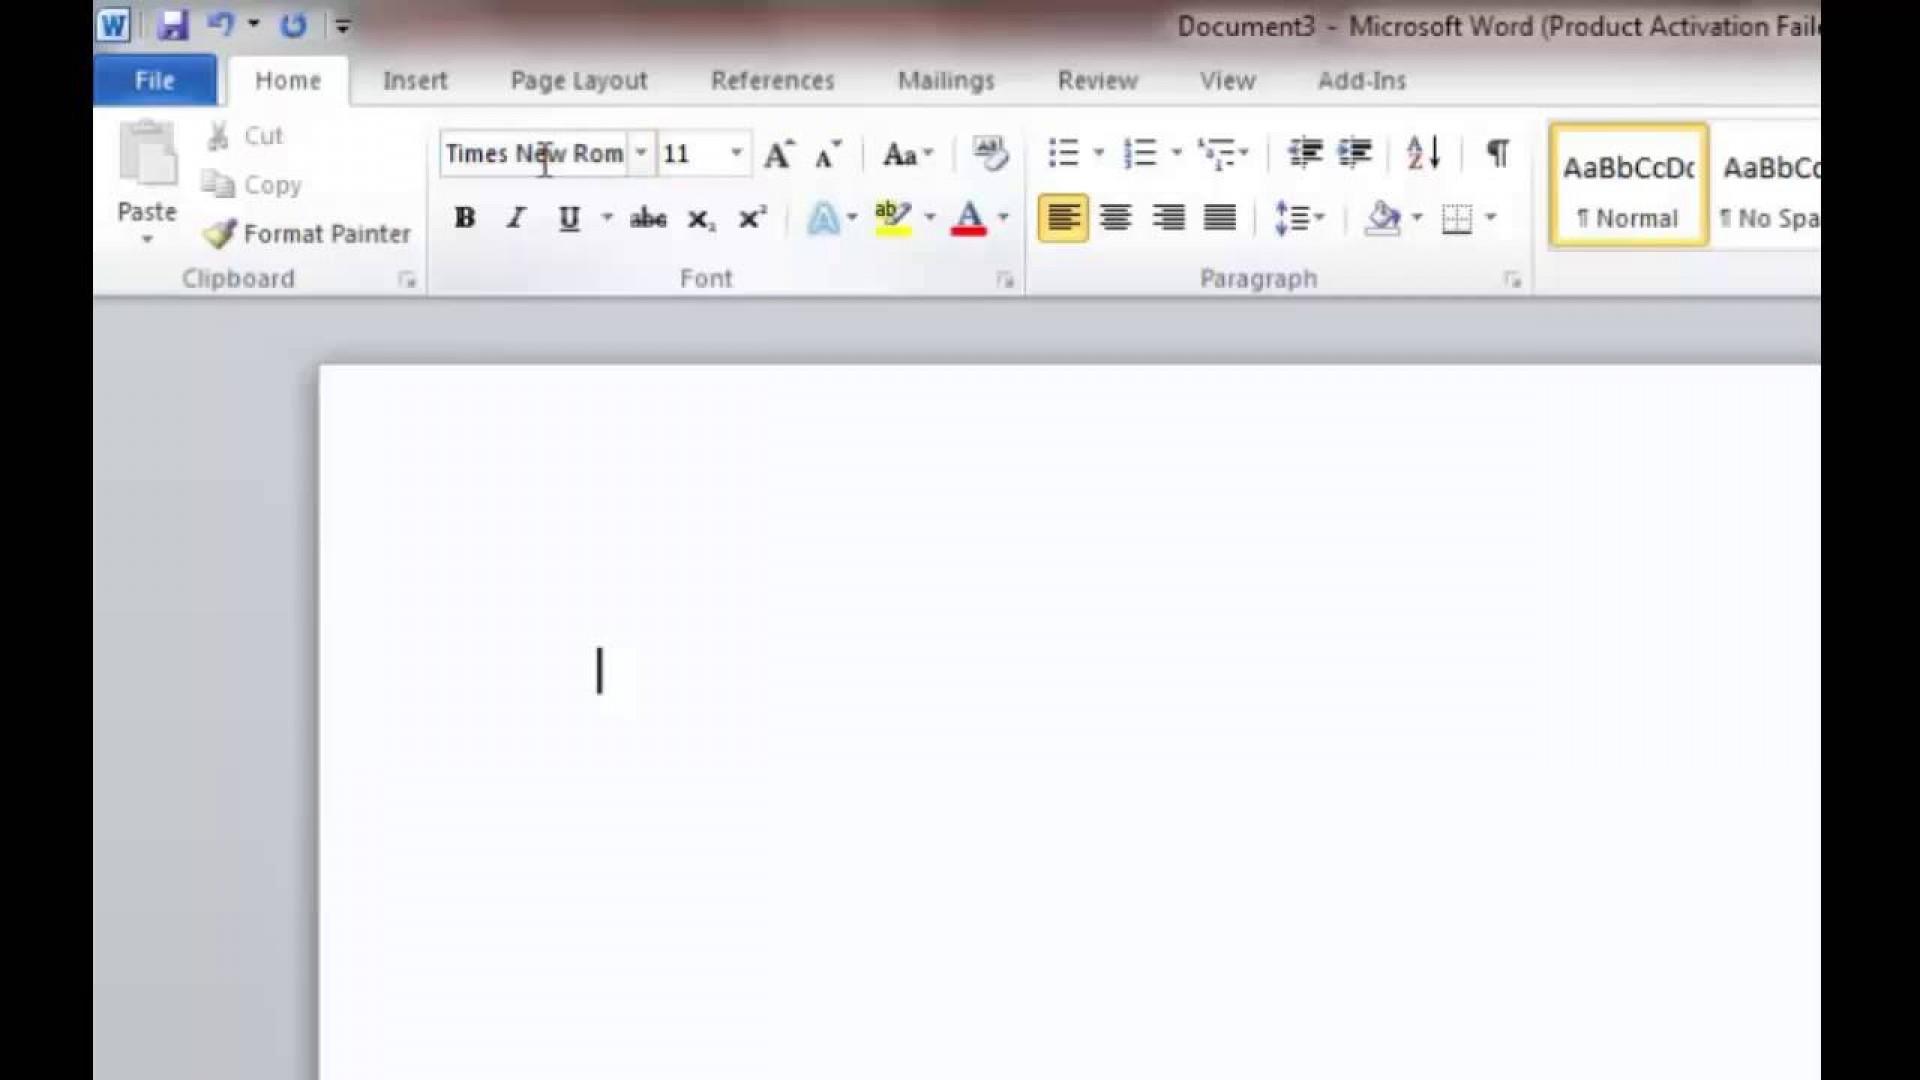 019 Essay Font Size Maxresdefault Stunning Formal Apa 1920